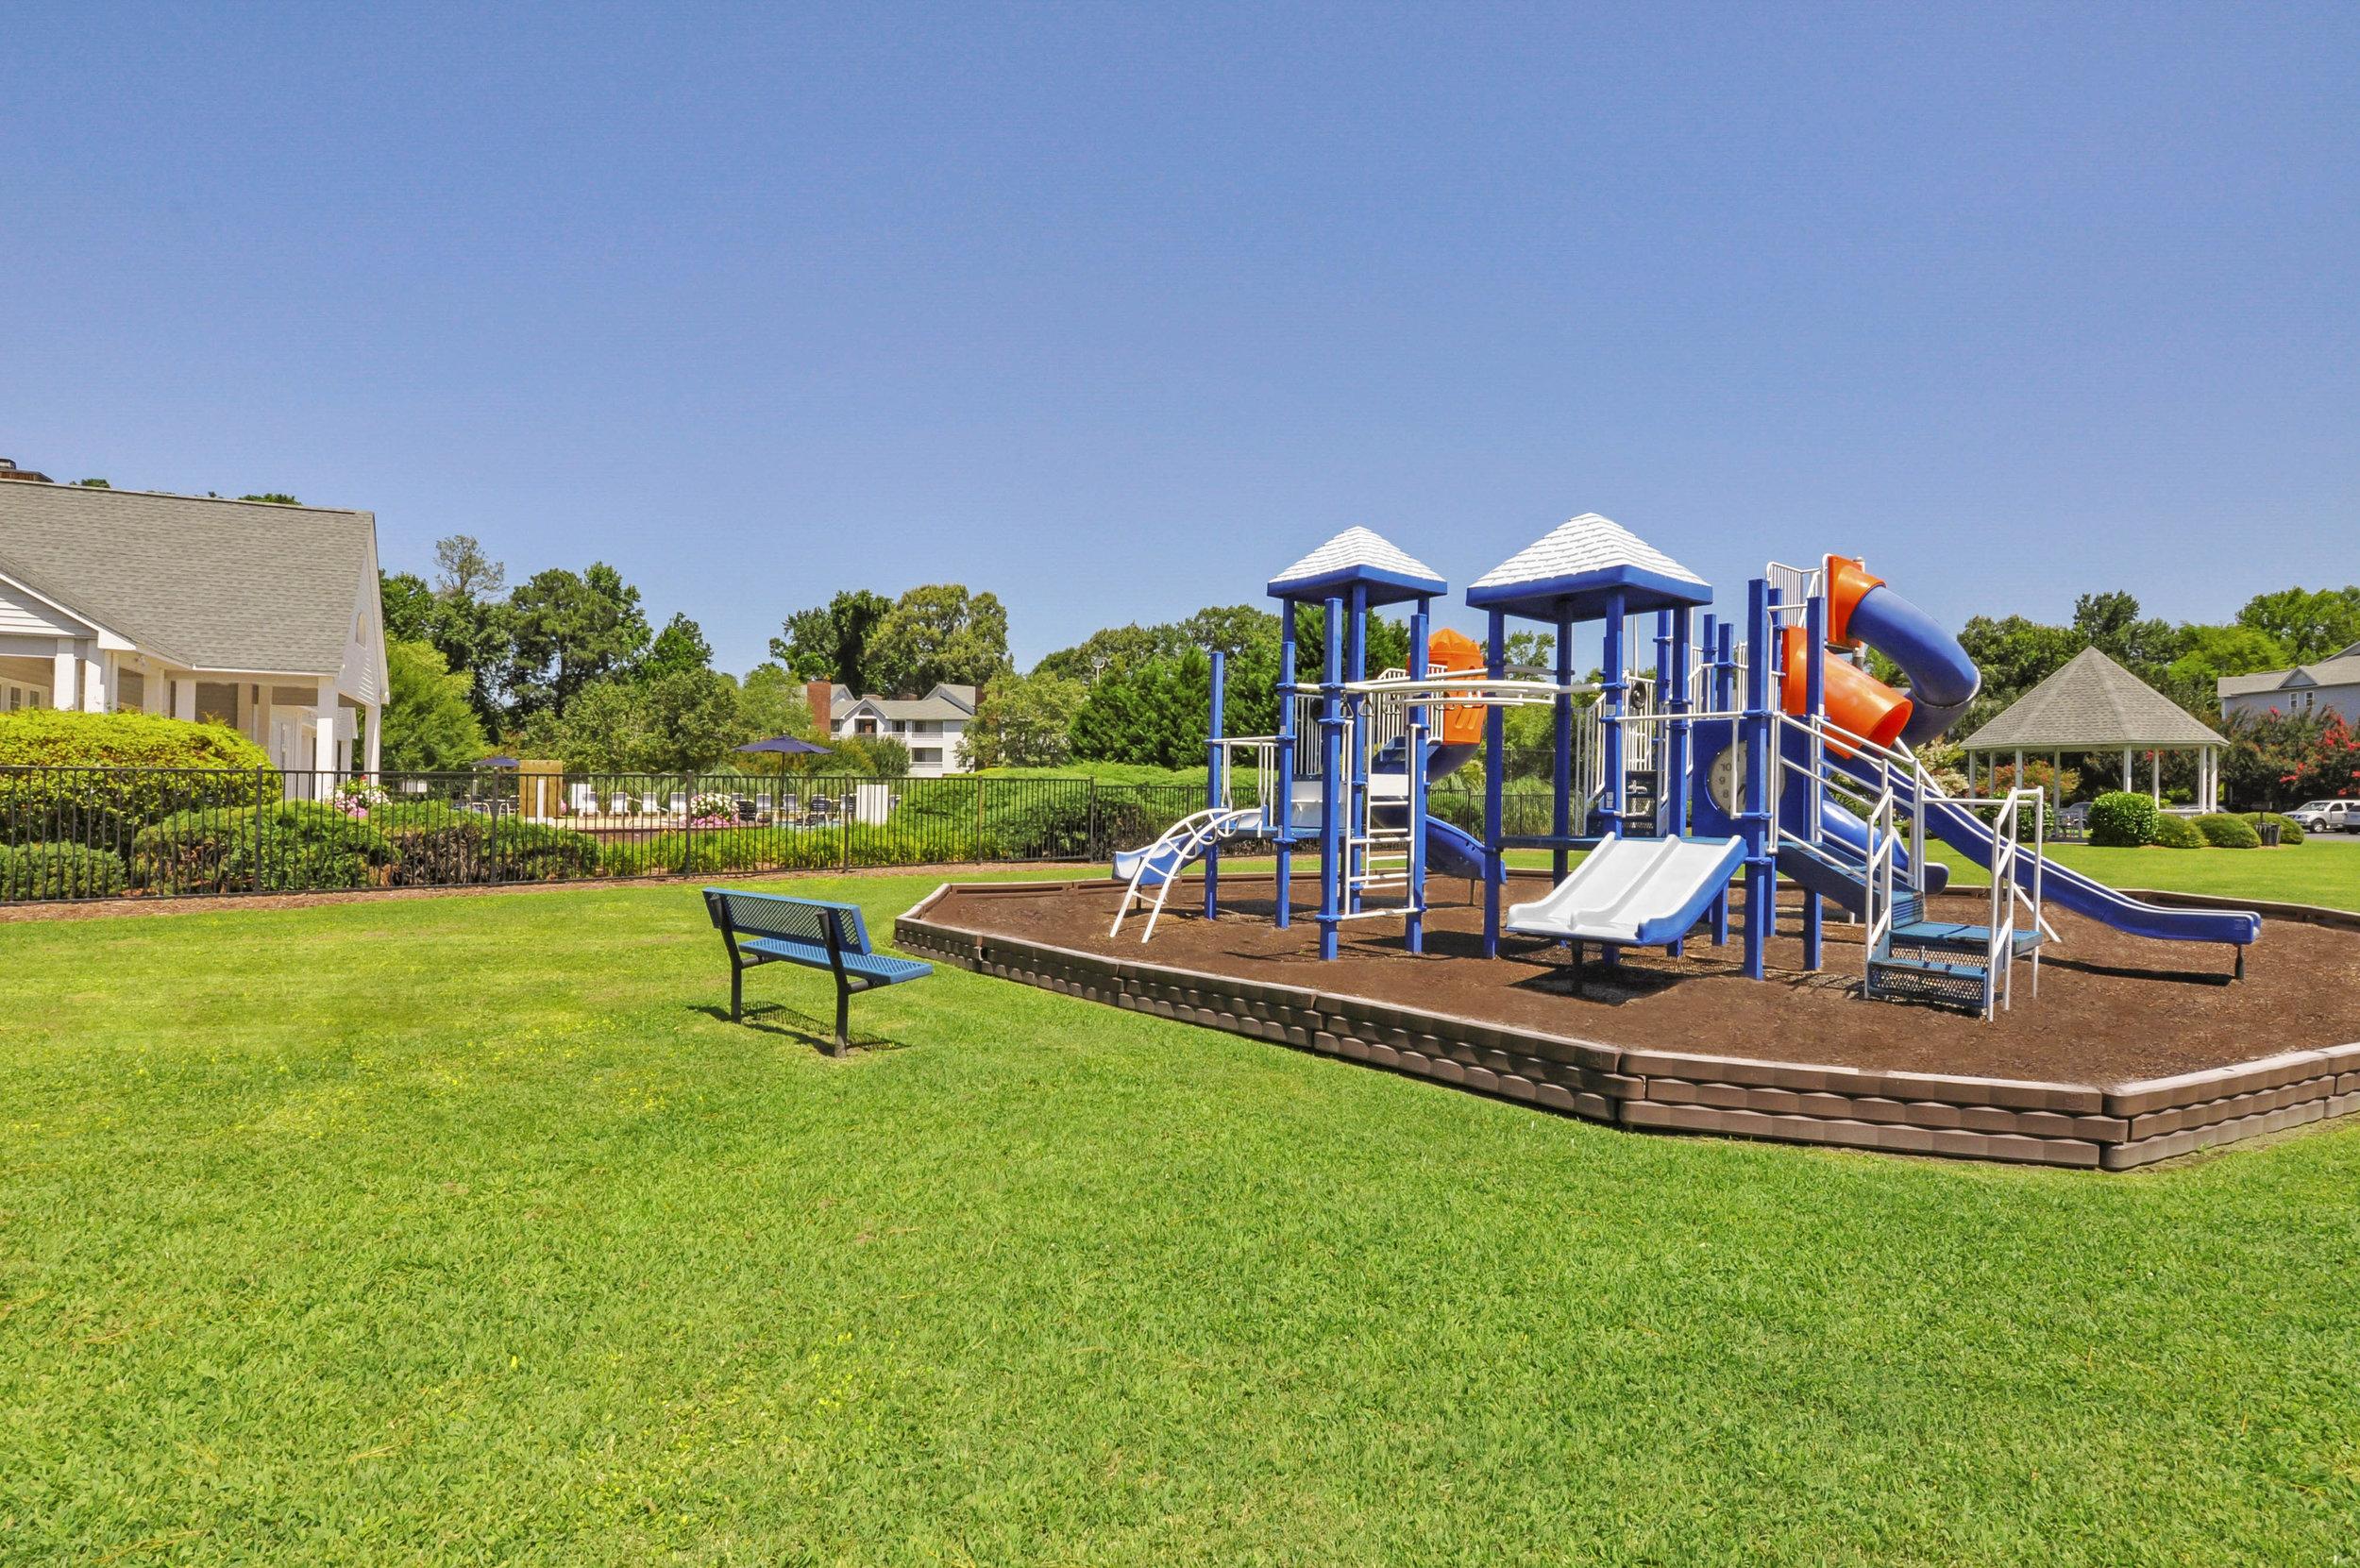 Playground Treybrooke Greenville NC-PH-15 2.JPG